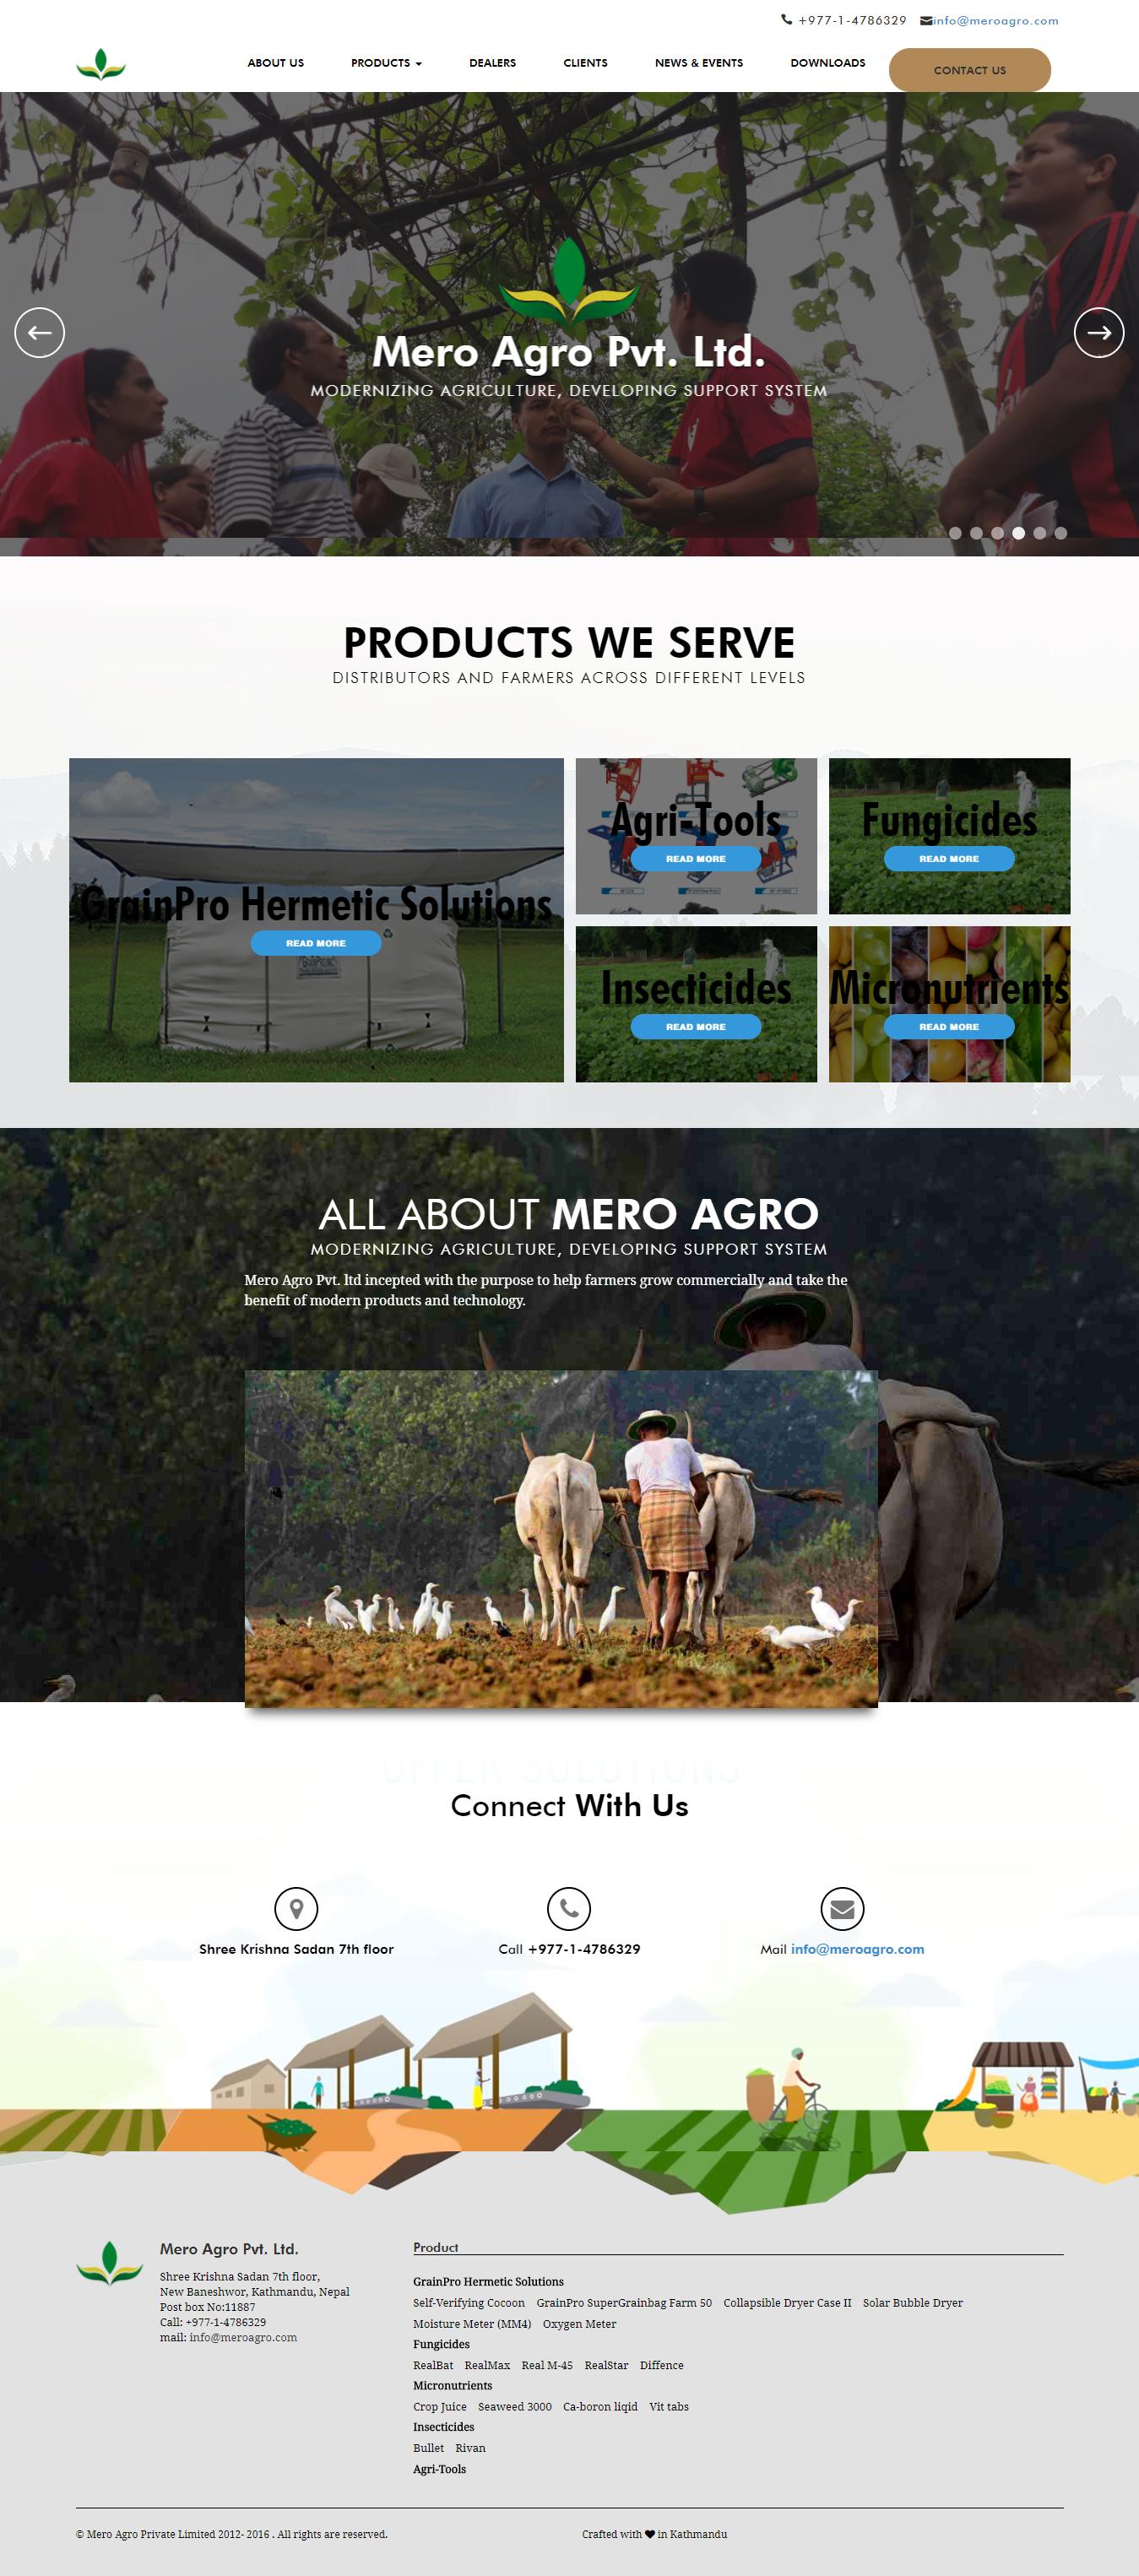 Mero Agro Pvt. Ltd.